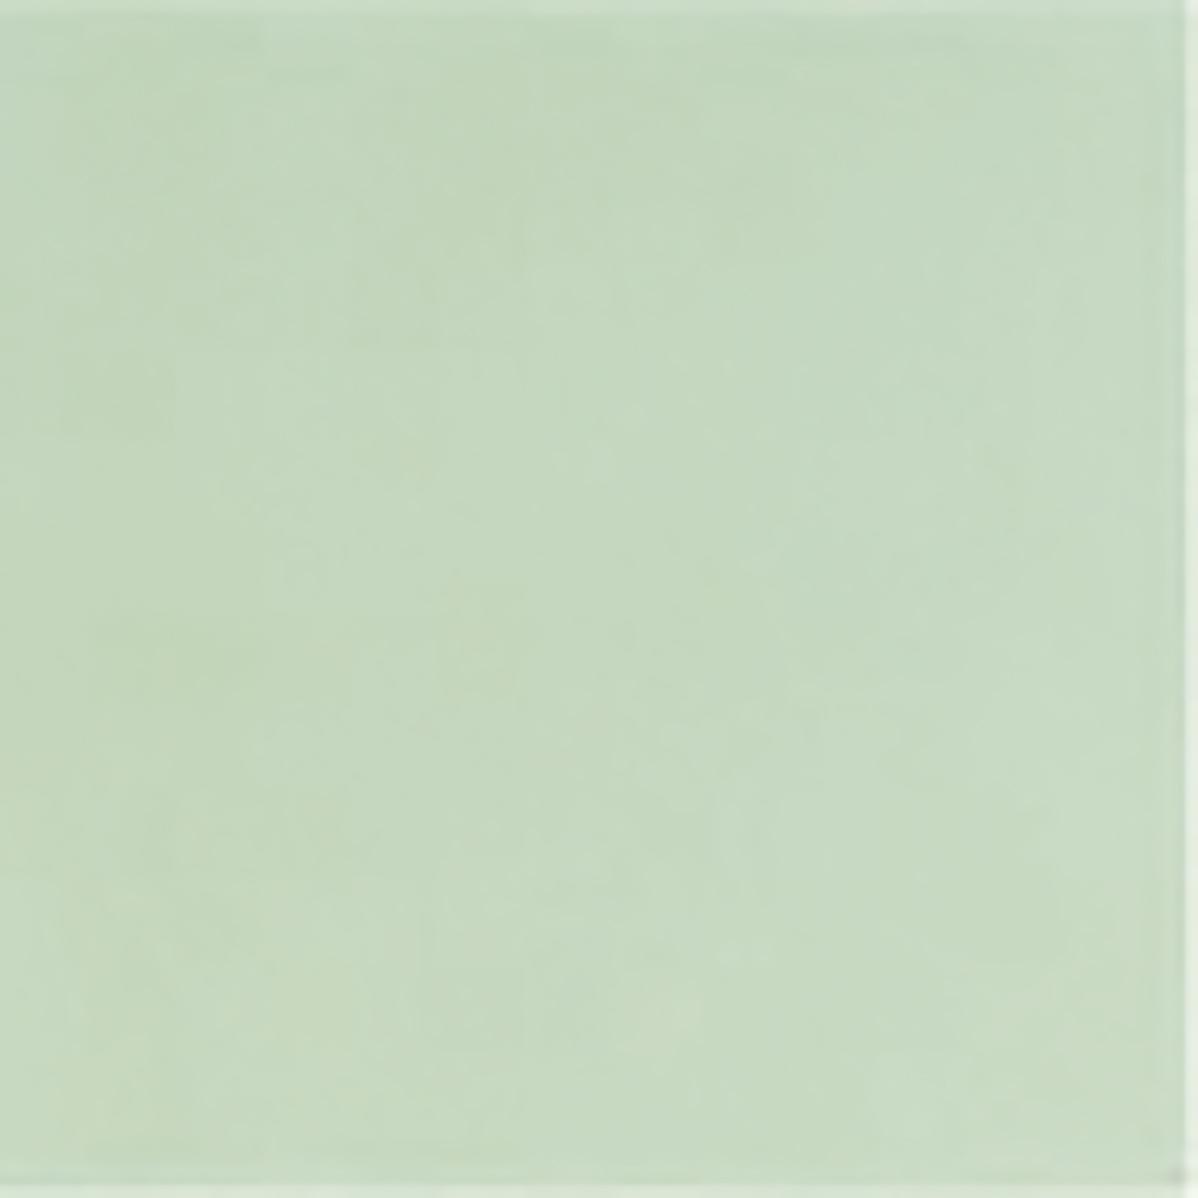 Sigma Verde 20 x 20